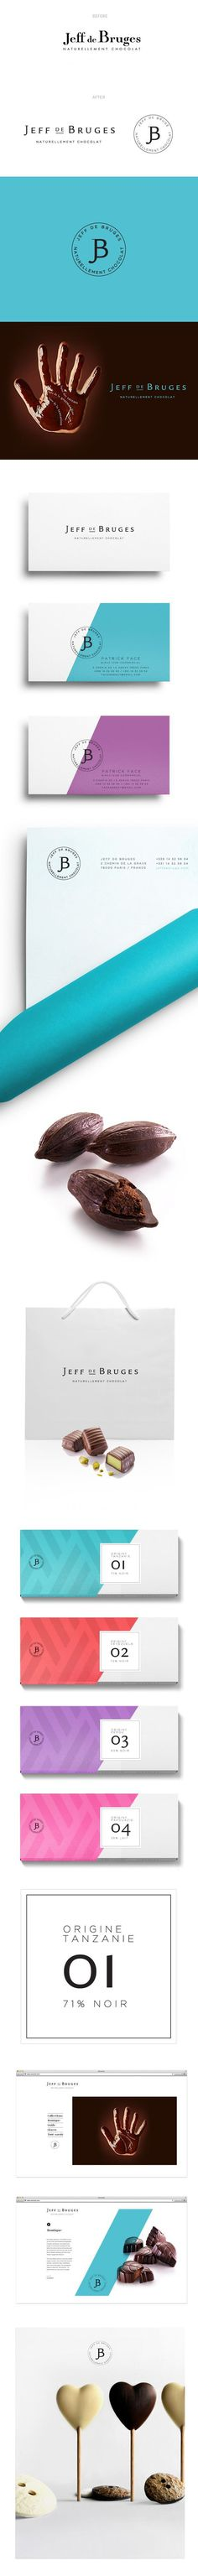 Jeff de Bruges #brand #identity